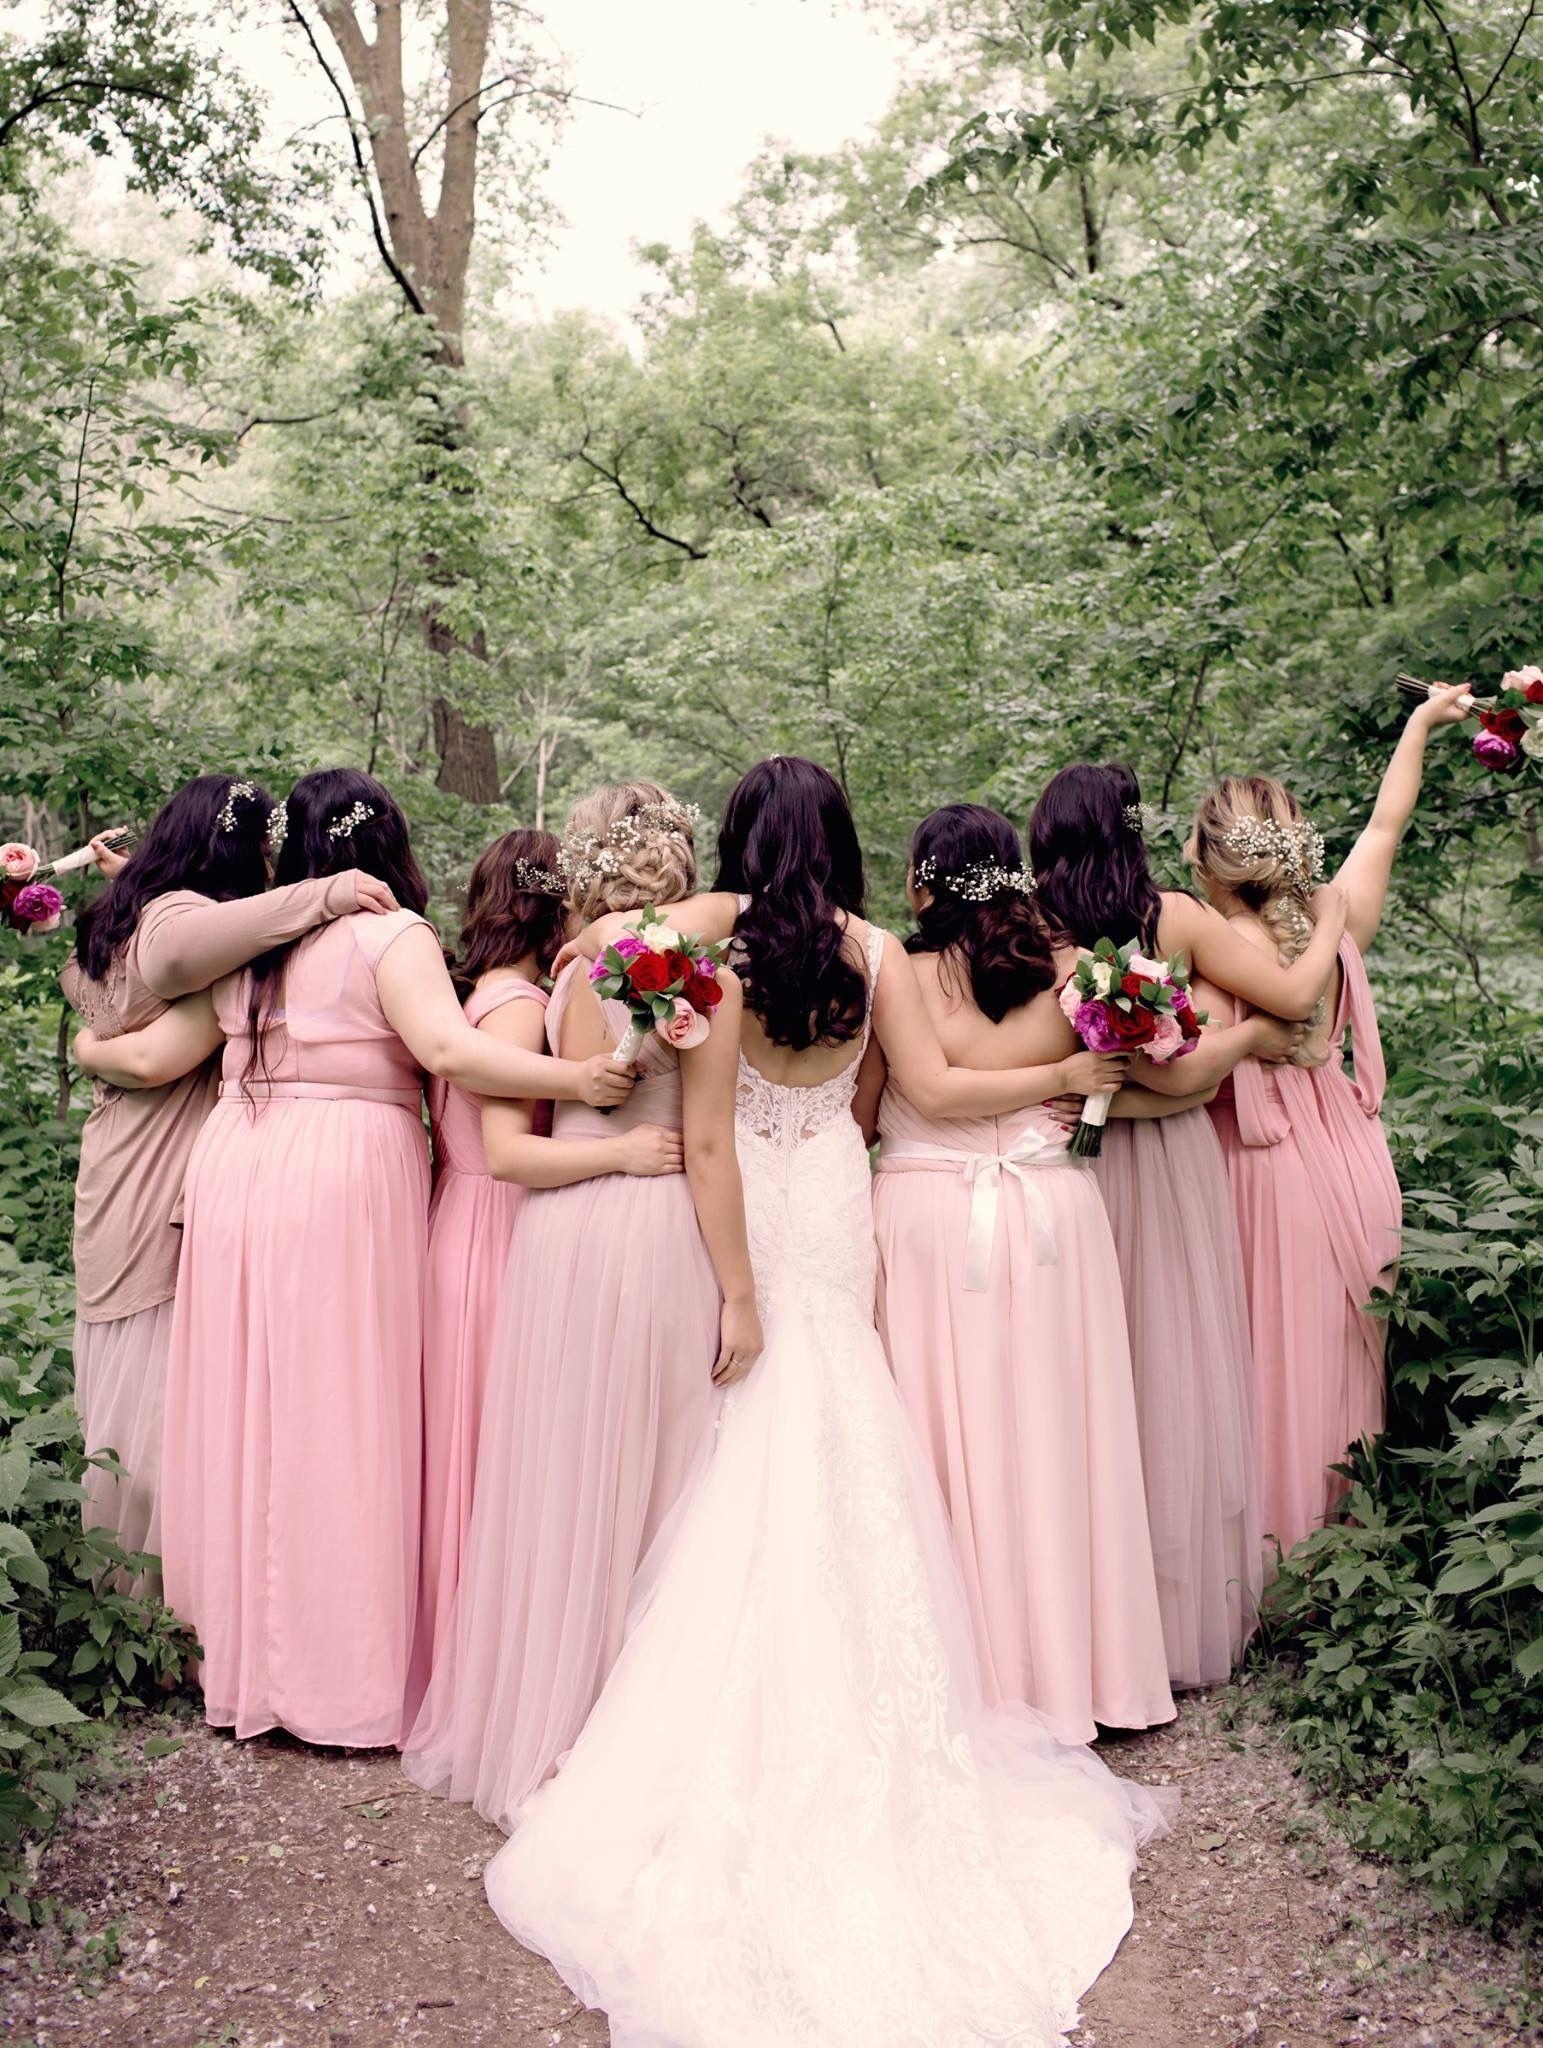 Mismatched pink bridesmaids dresses wedding pinterest wedding mismatched pink bridesmaids dresses ombrellifo Images